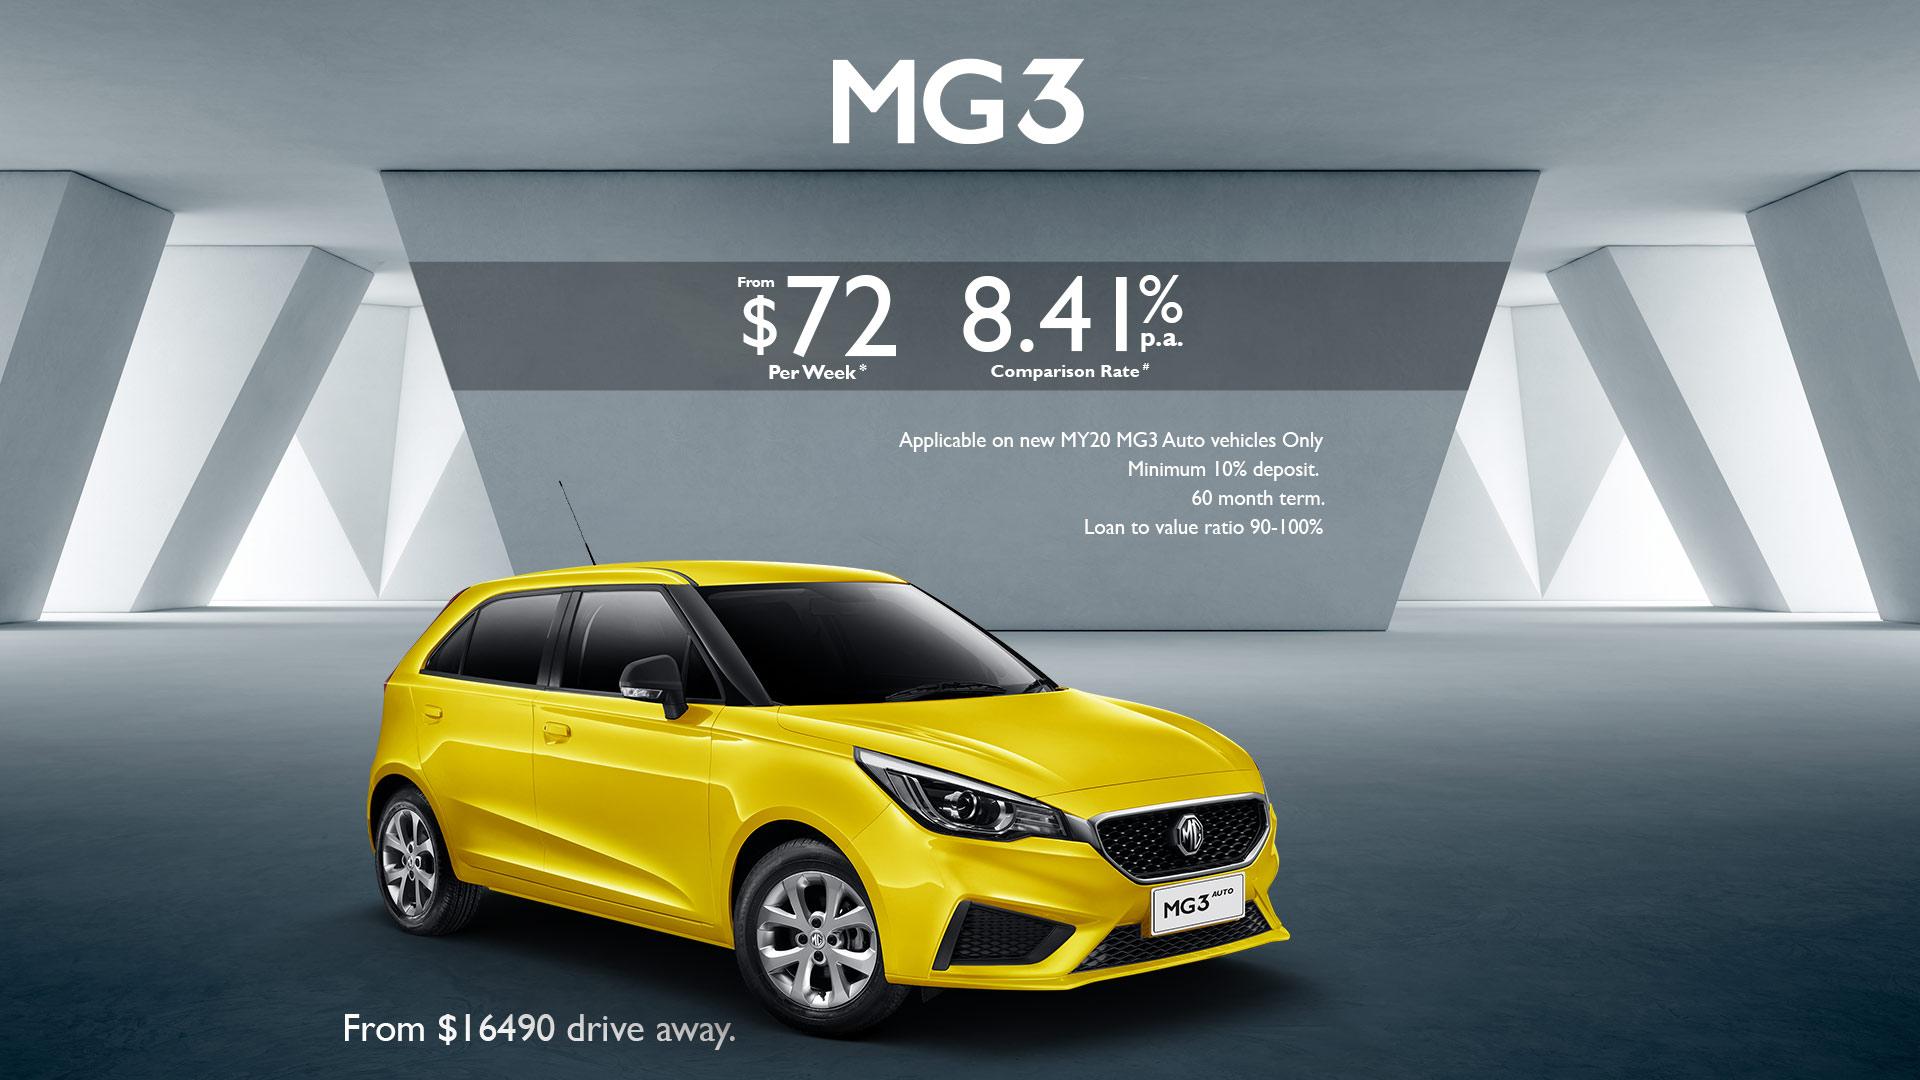 Nova MG Finance Offer